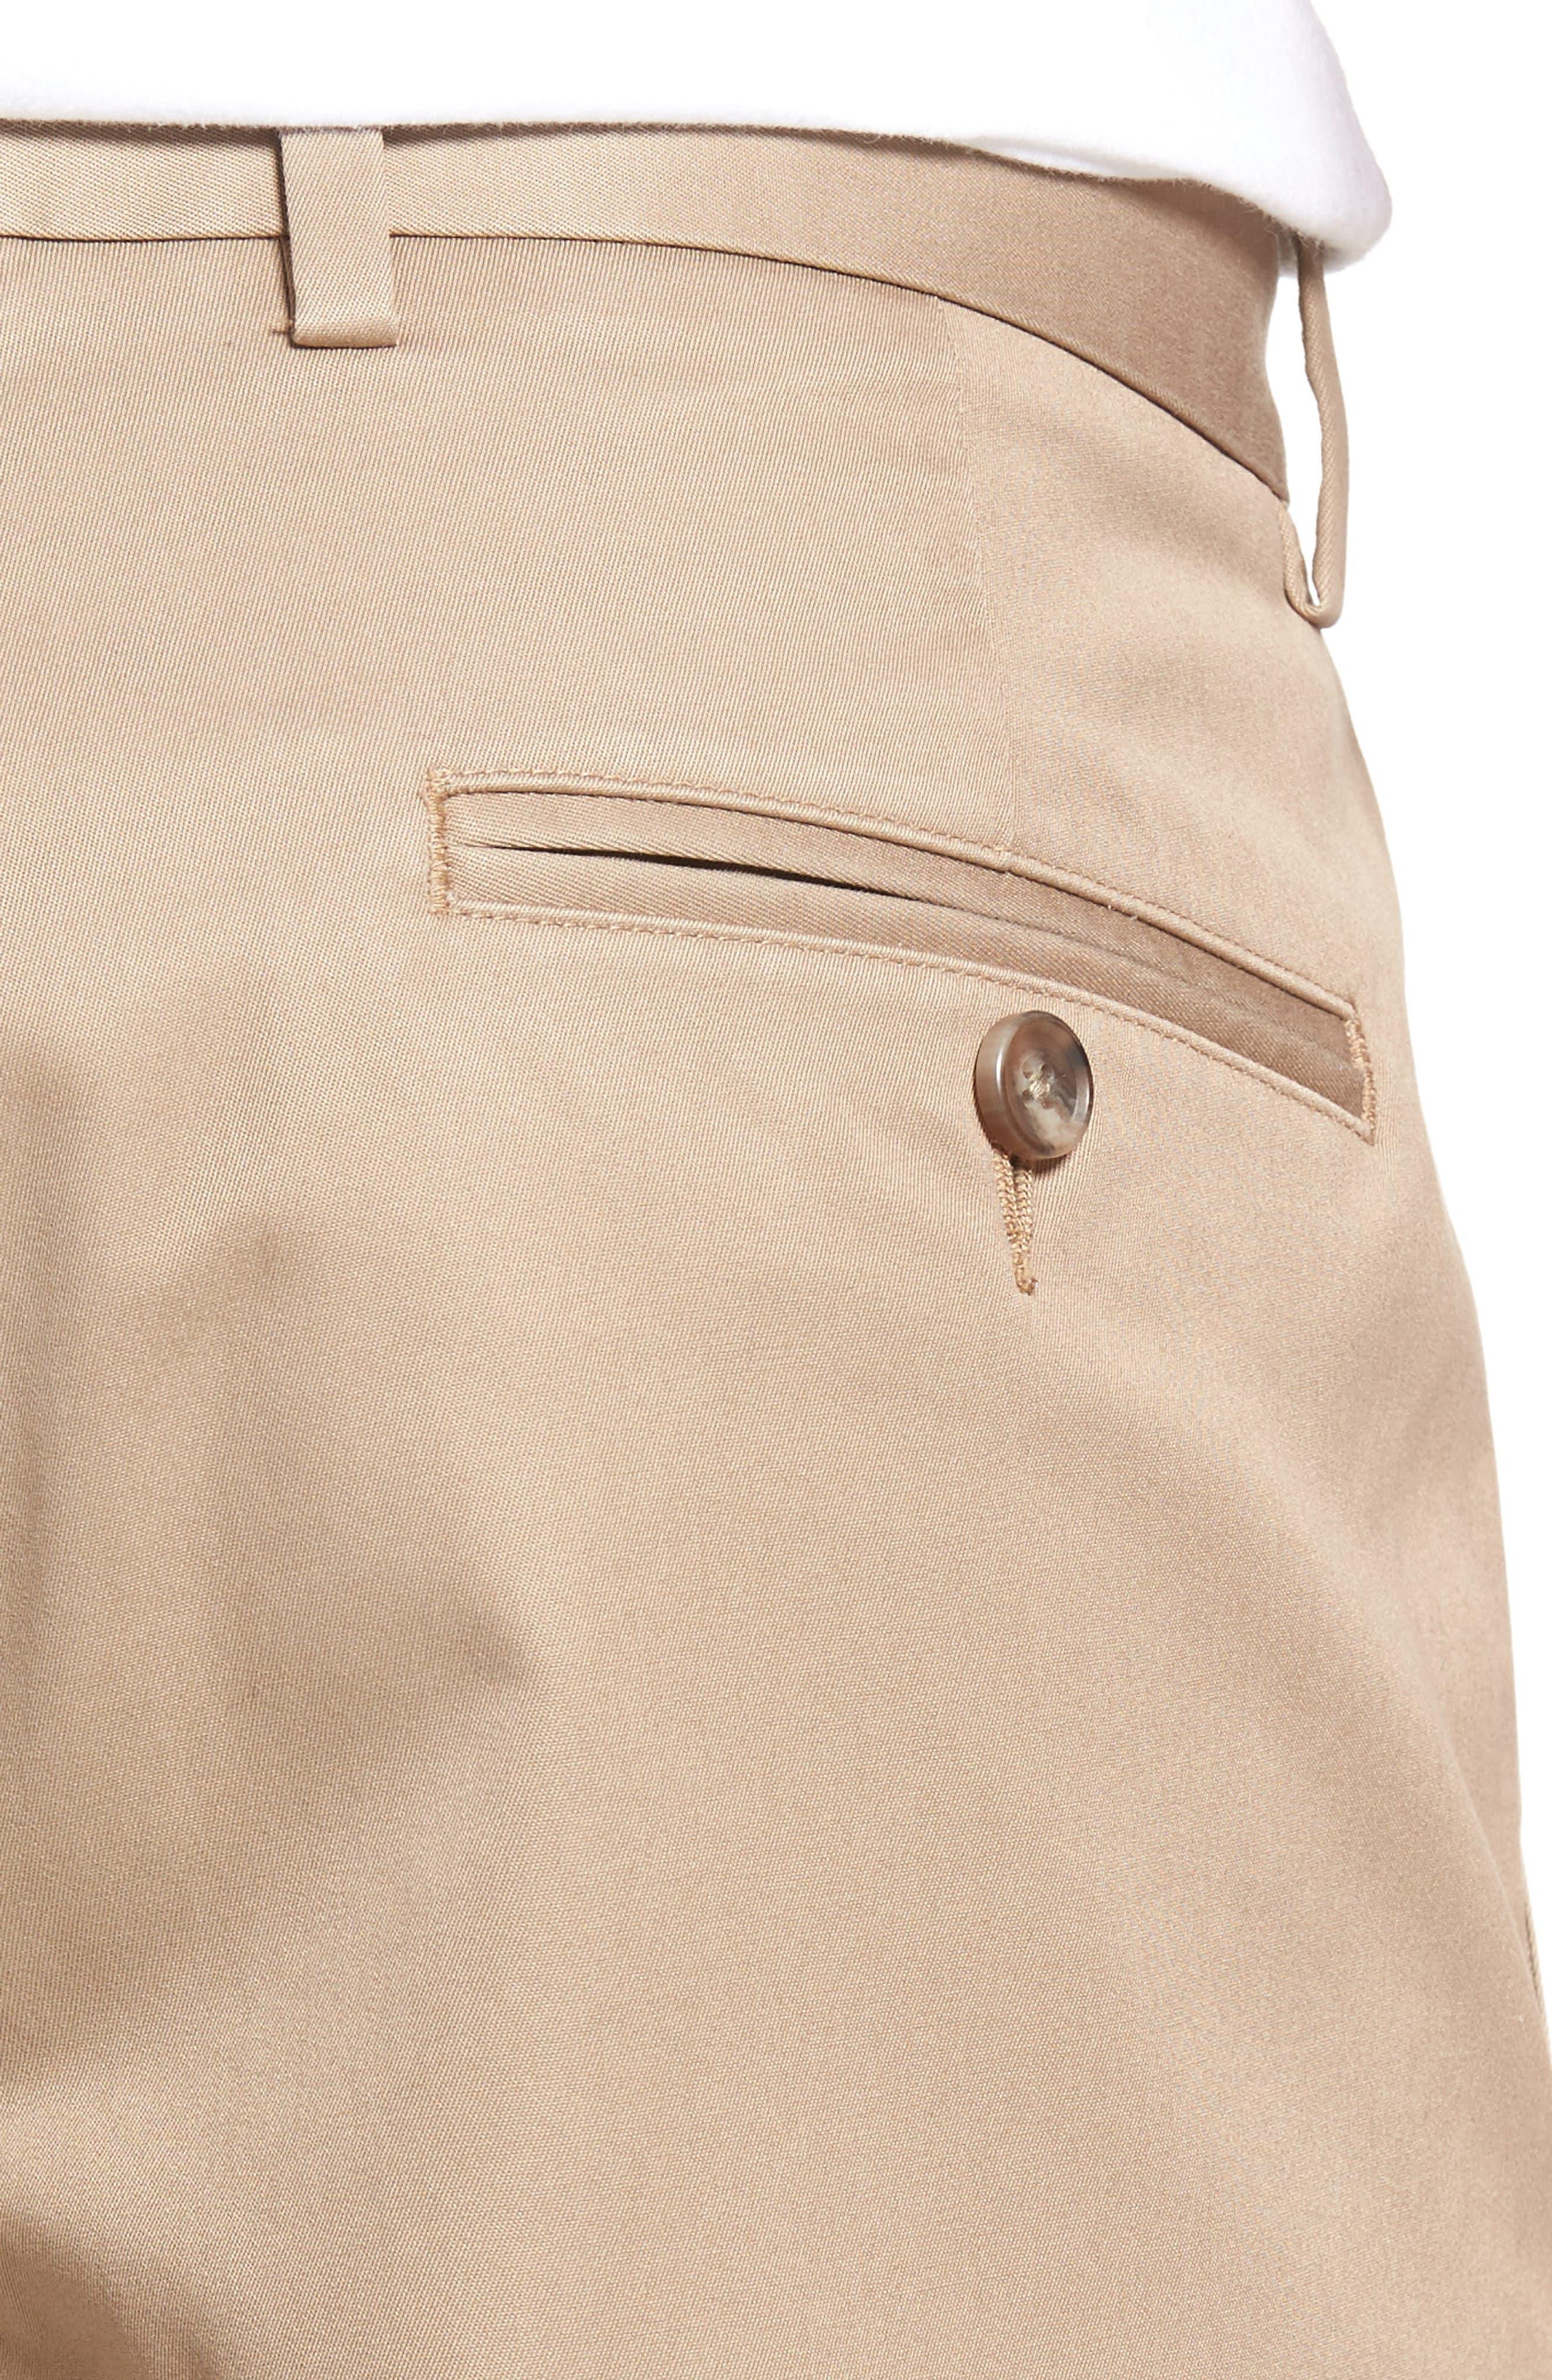 Pleated Supima<sup>®</sup> Cotton Shorts,                             Alternate thumbnail 18, color,